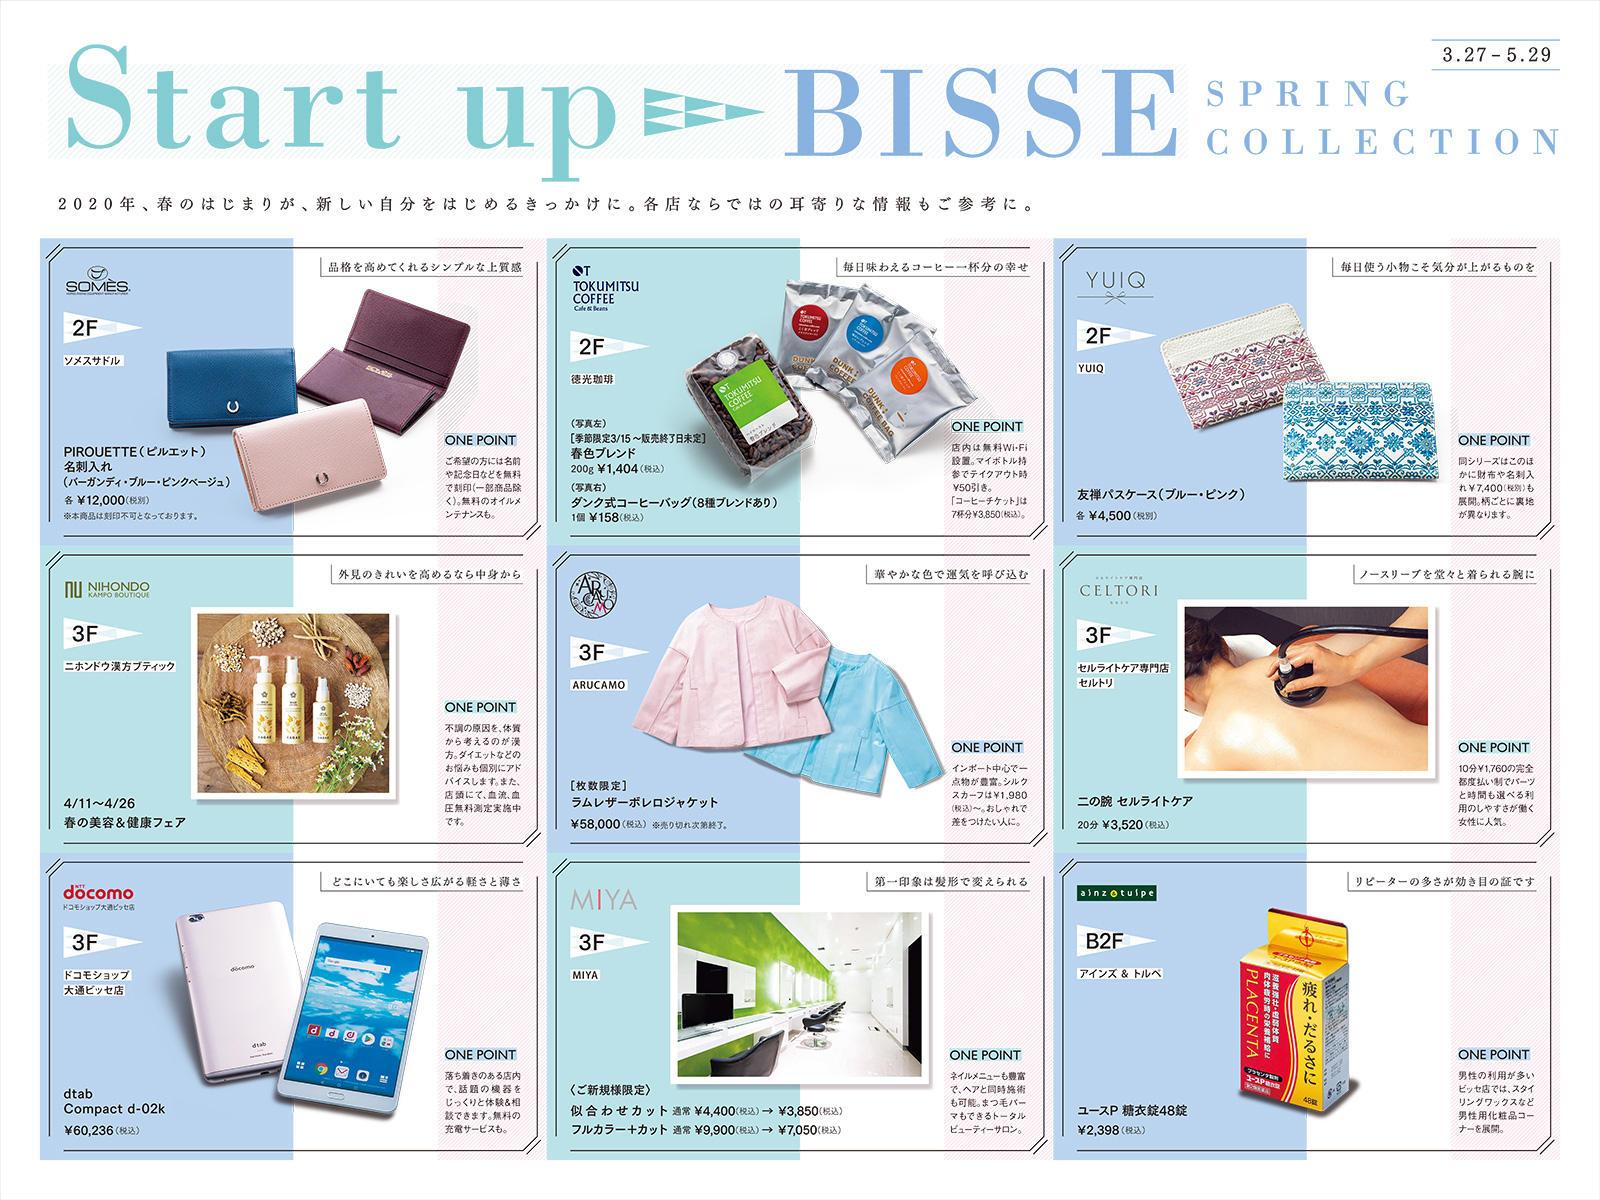 https://www.odori-bisse.com/info/news_200325_img2.jpg